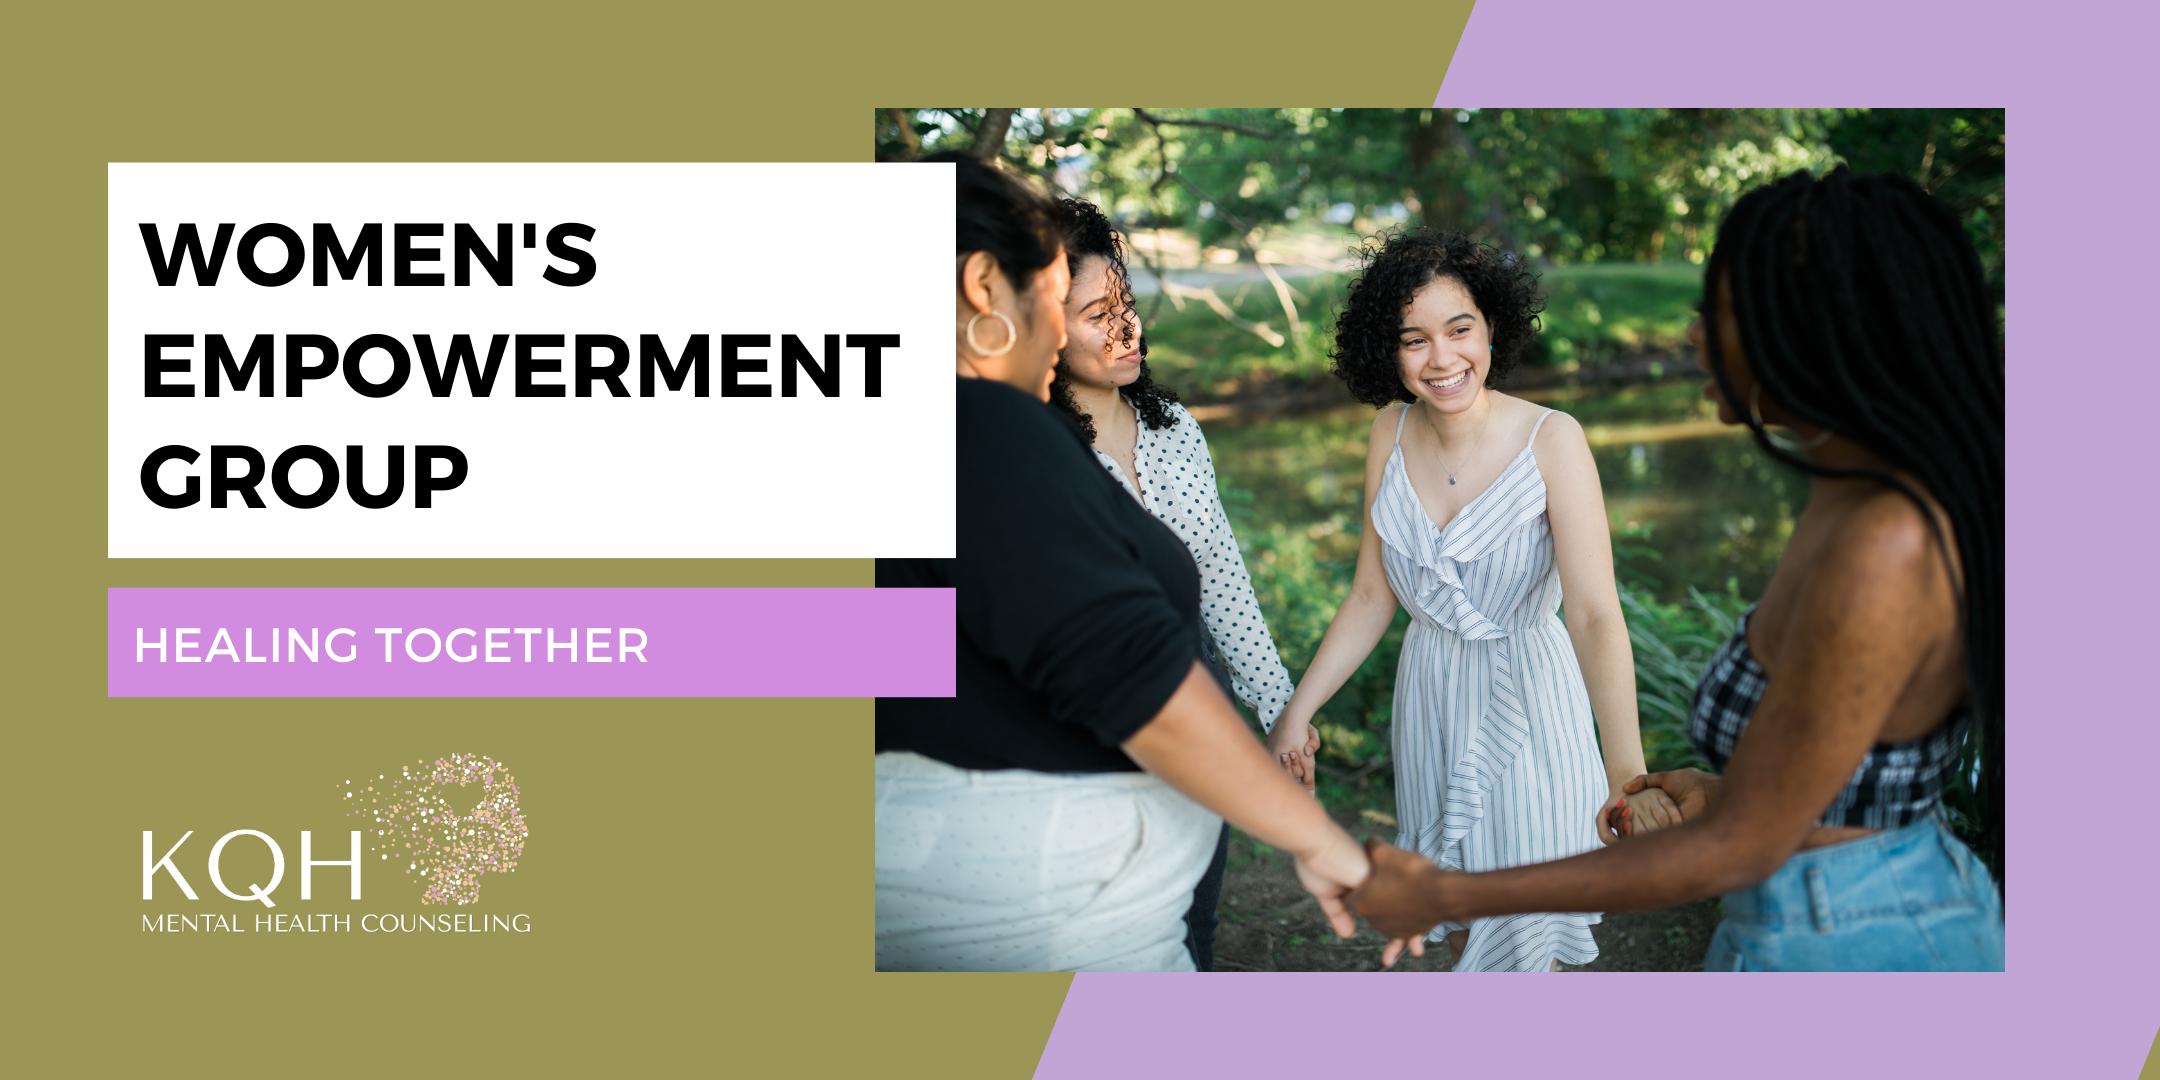 Women's Empowerment Group